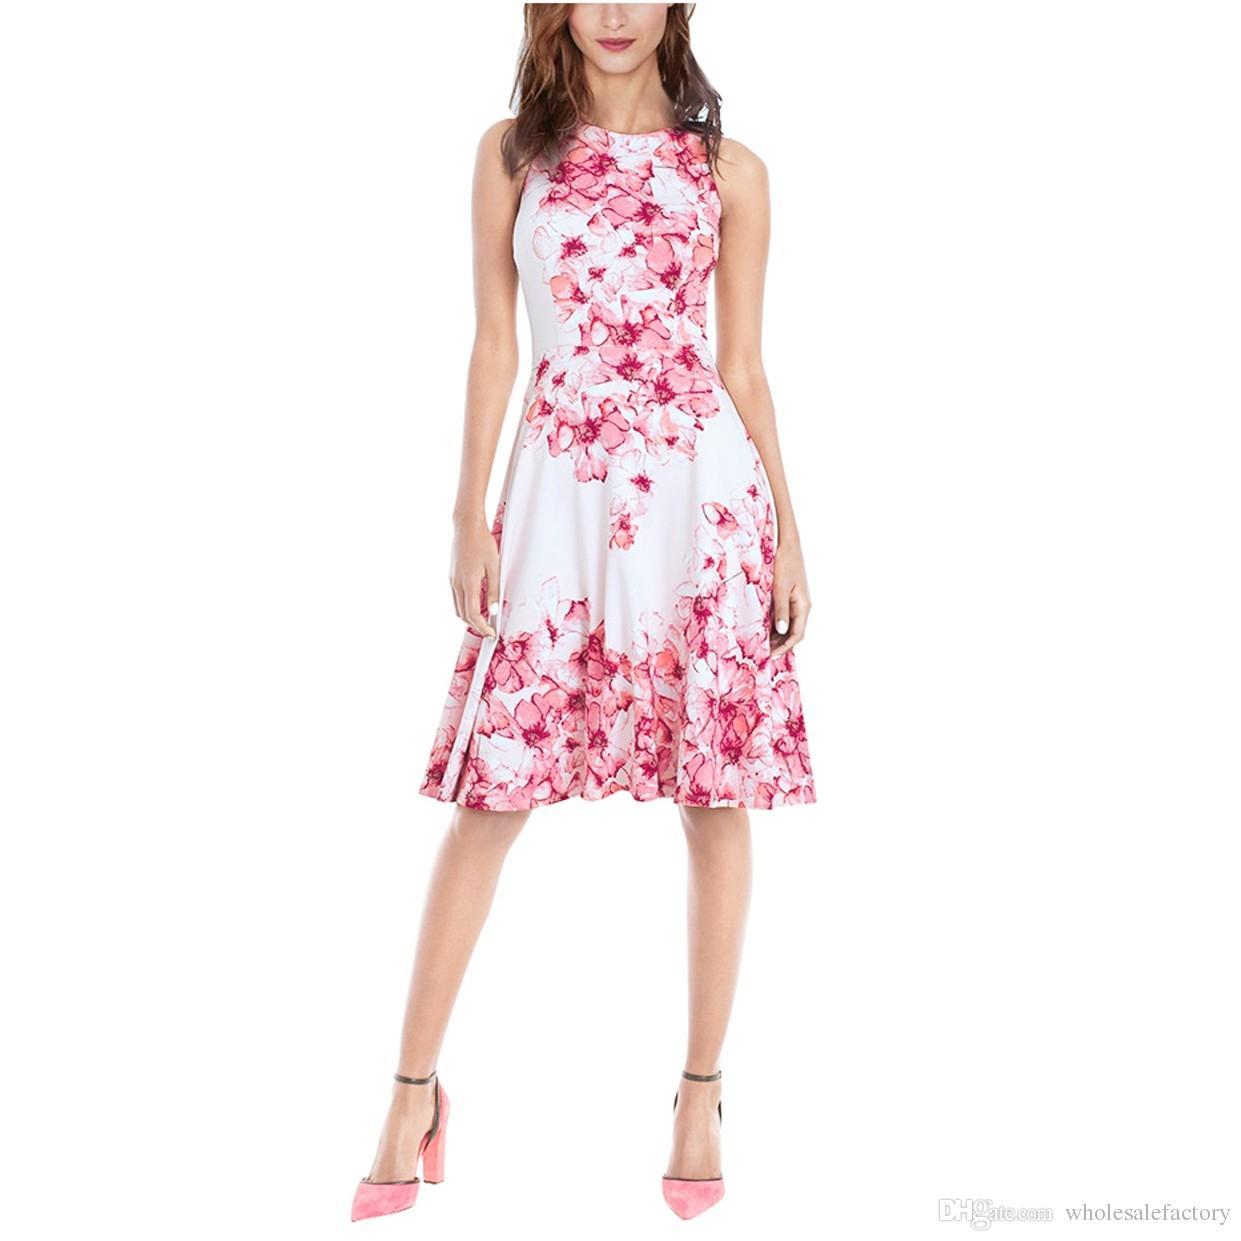 2018 Summer Women Dress Audrey Hepburn Vestidos Sleeveless Polka Floral Print Clothing Cotton 50s Casual Party Rockbilly Plus Size FS2010